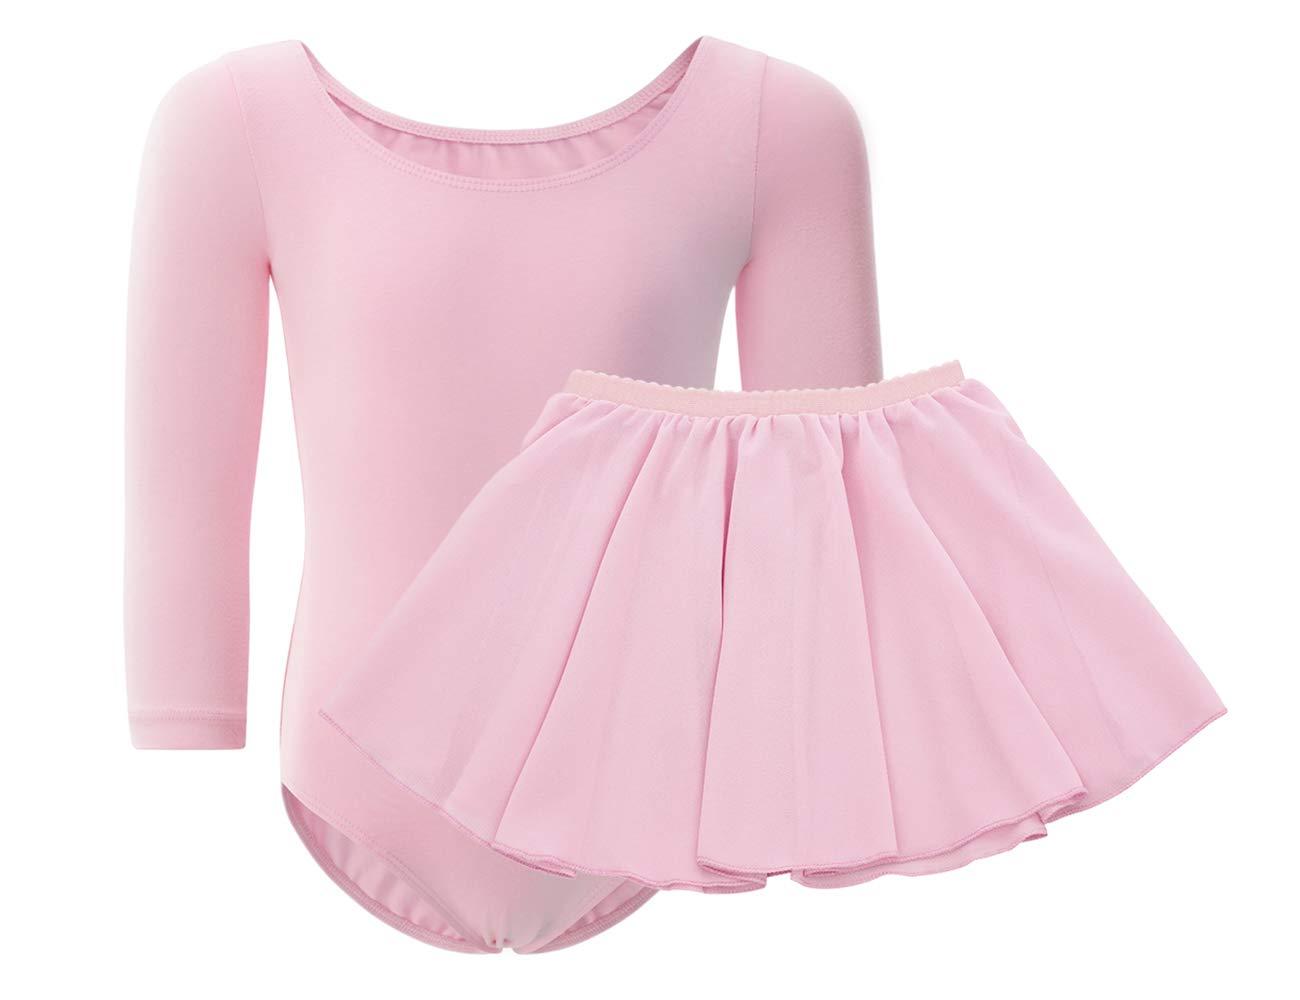 WEGETIT Gymnastics Leotards for Girls Toddler Ballet Long Sleeve Dance Tutu